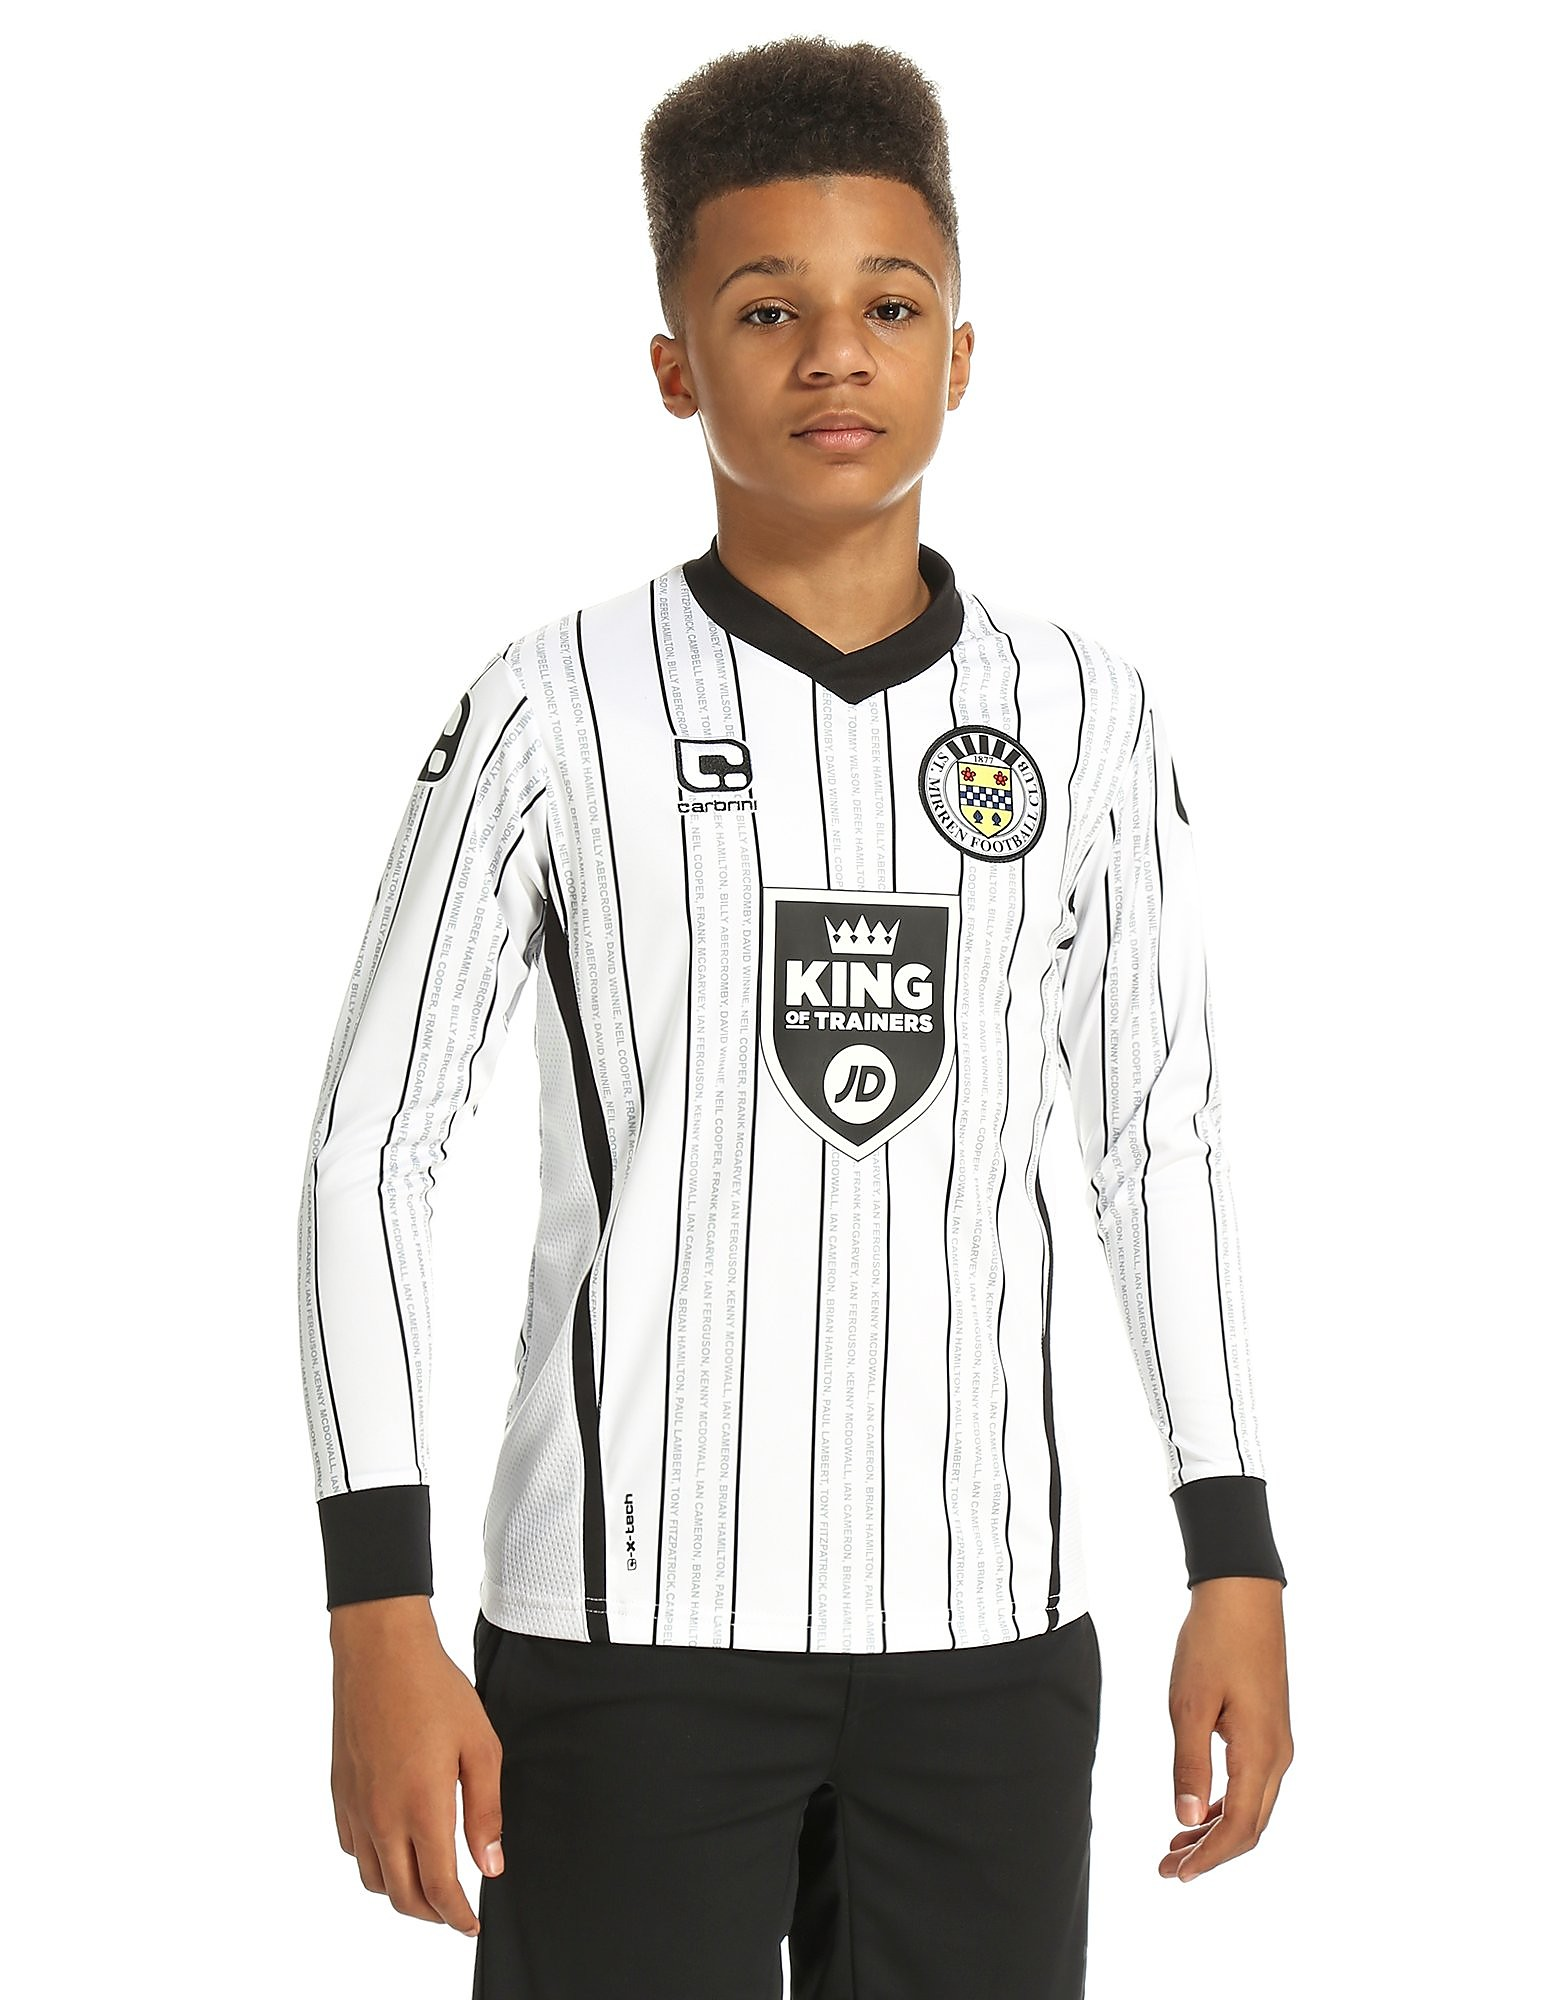 Carbrini St Mirren FC 2016/17 Home LS Shirt Jnr PRE ORDER